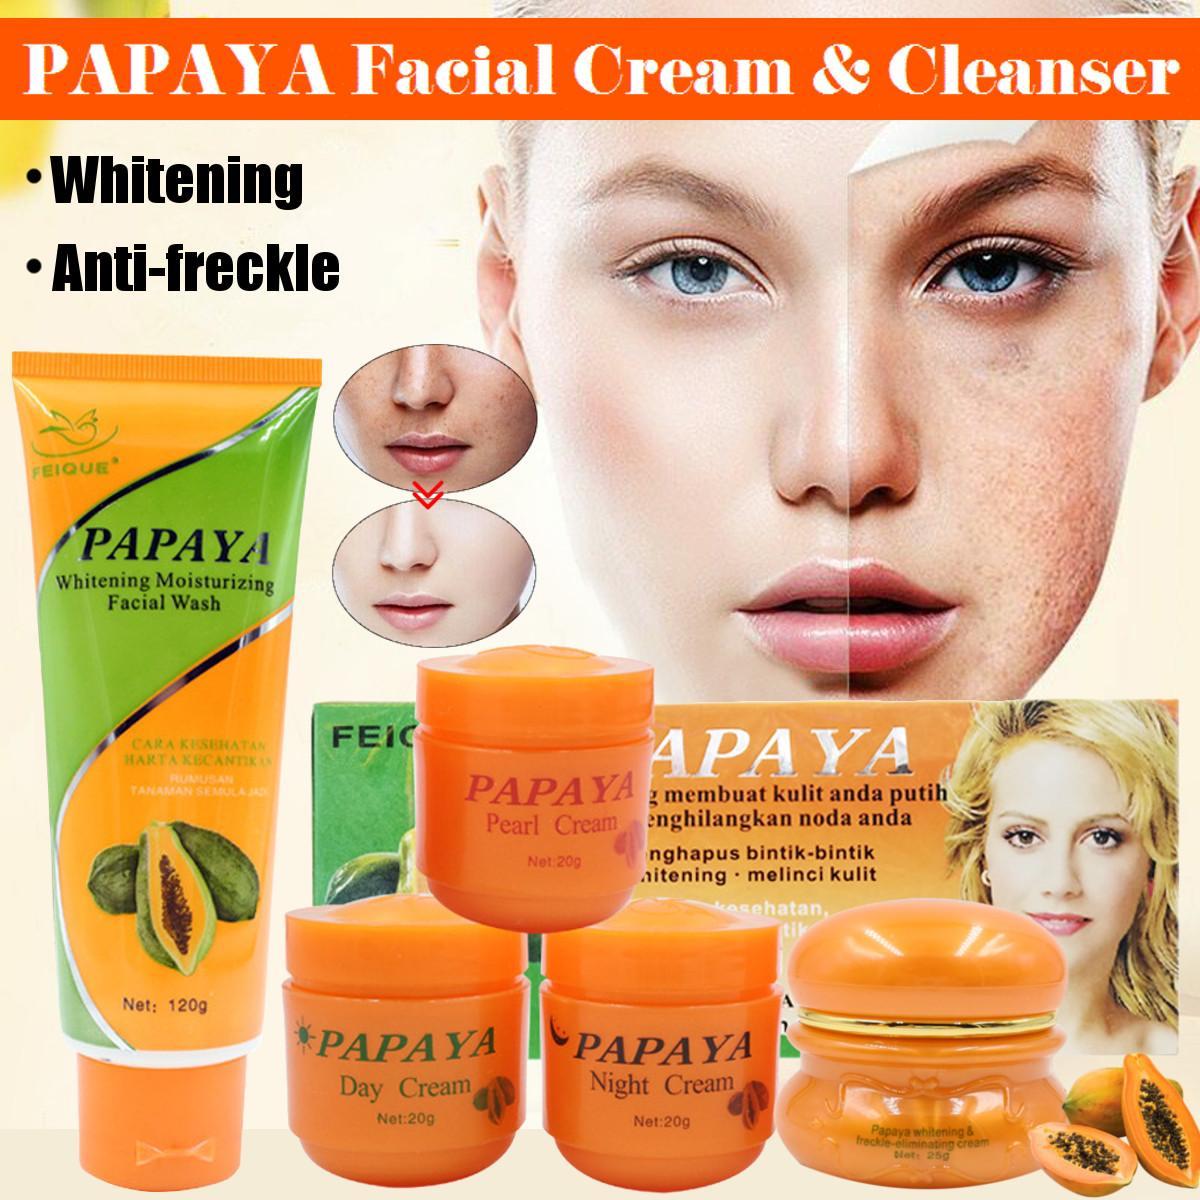 Papaya Whitening Cream For Face Anti Freckle Natural Botanical Formula Skin Care Day Cream+Night Cream+Pearl Cream+Whitening